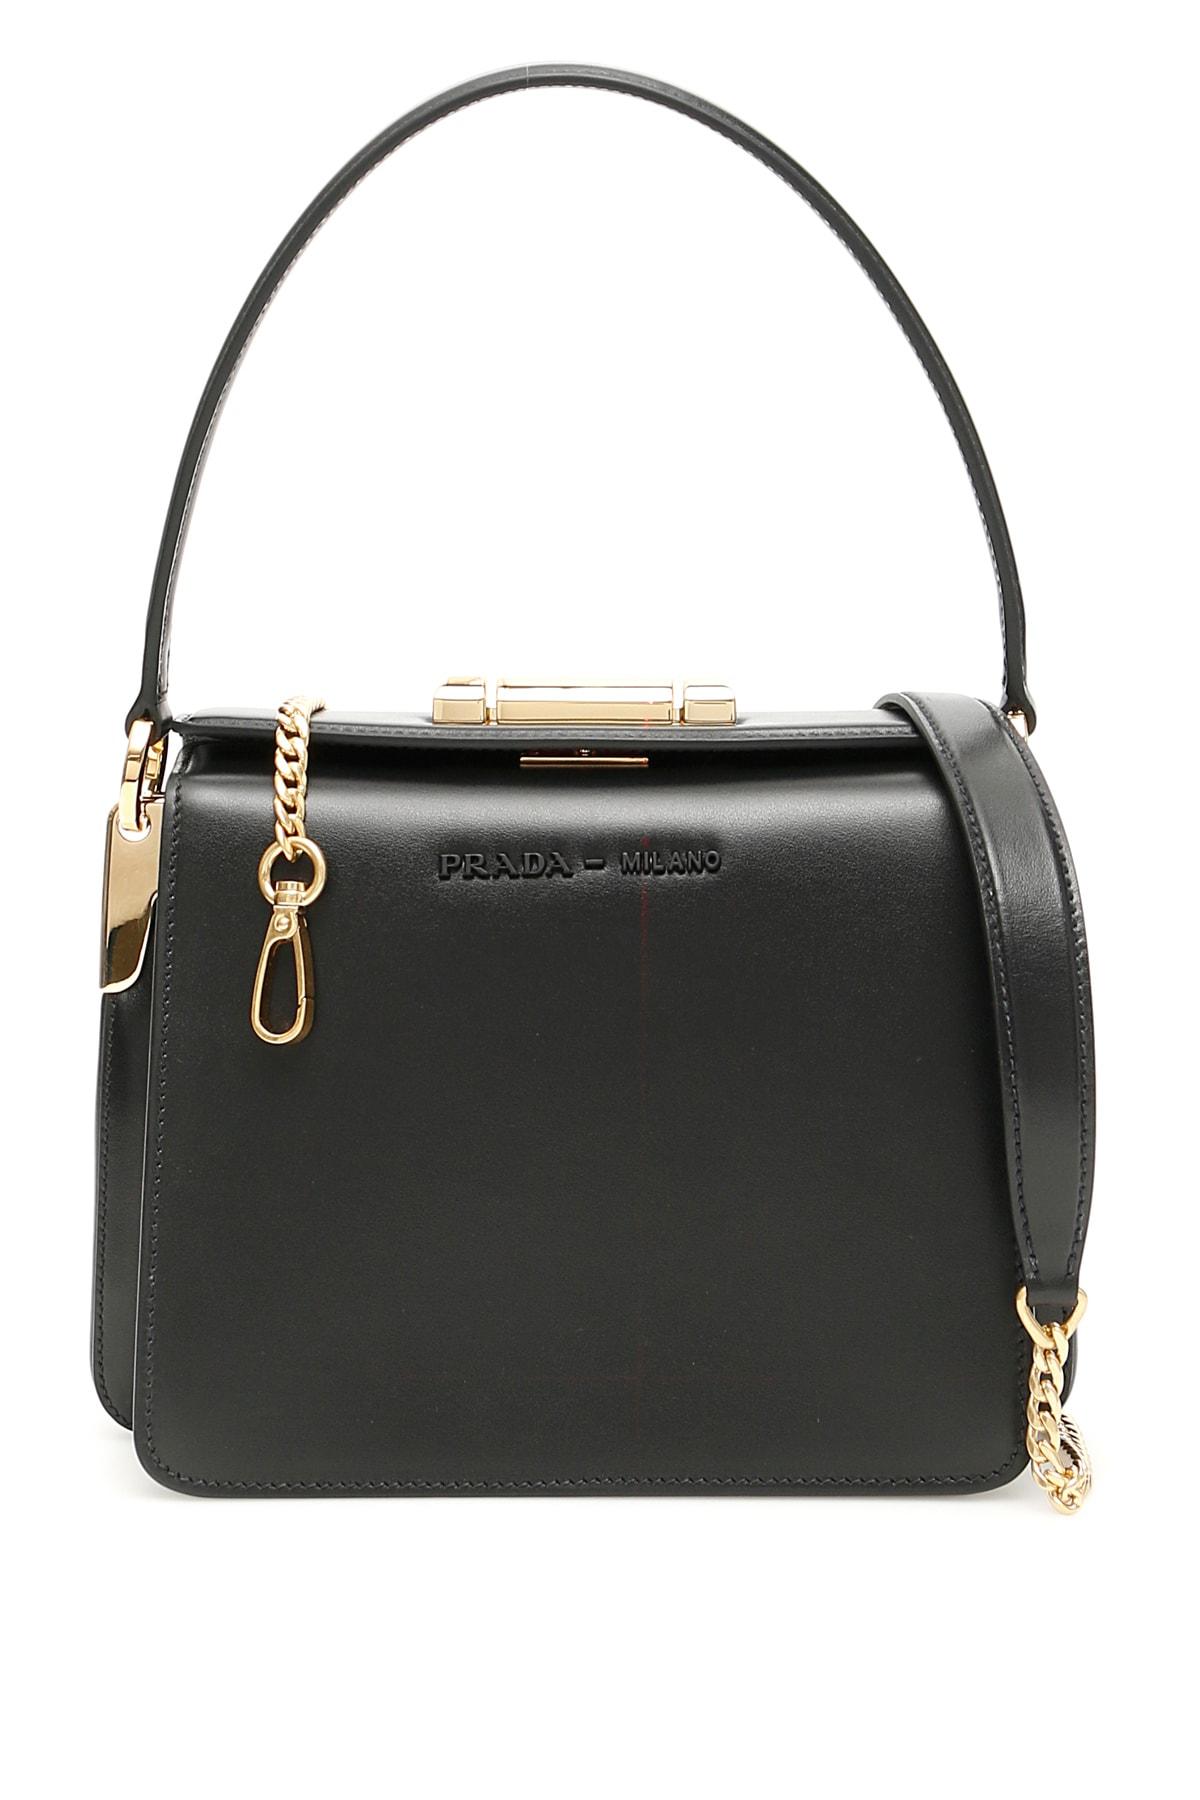 9726c48916 Prada Sybille Bag